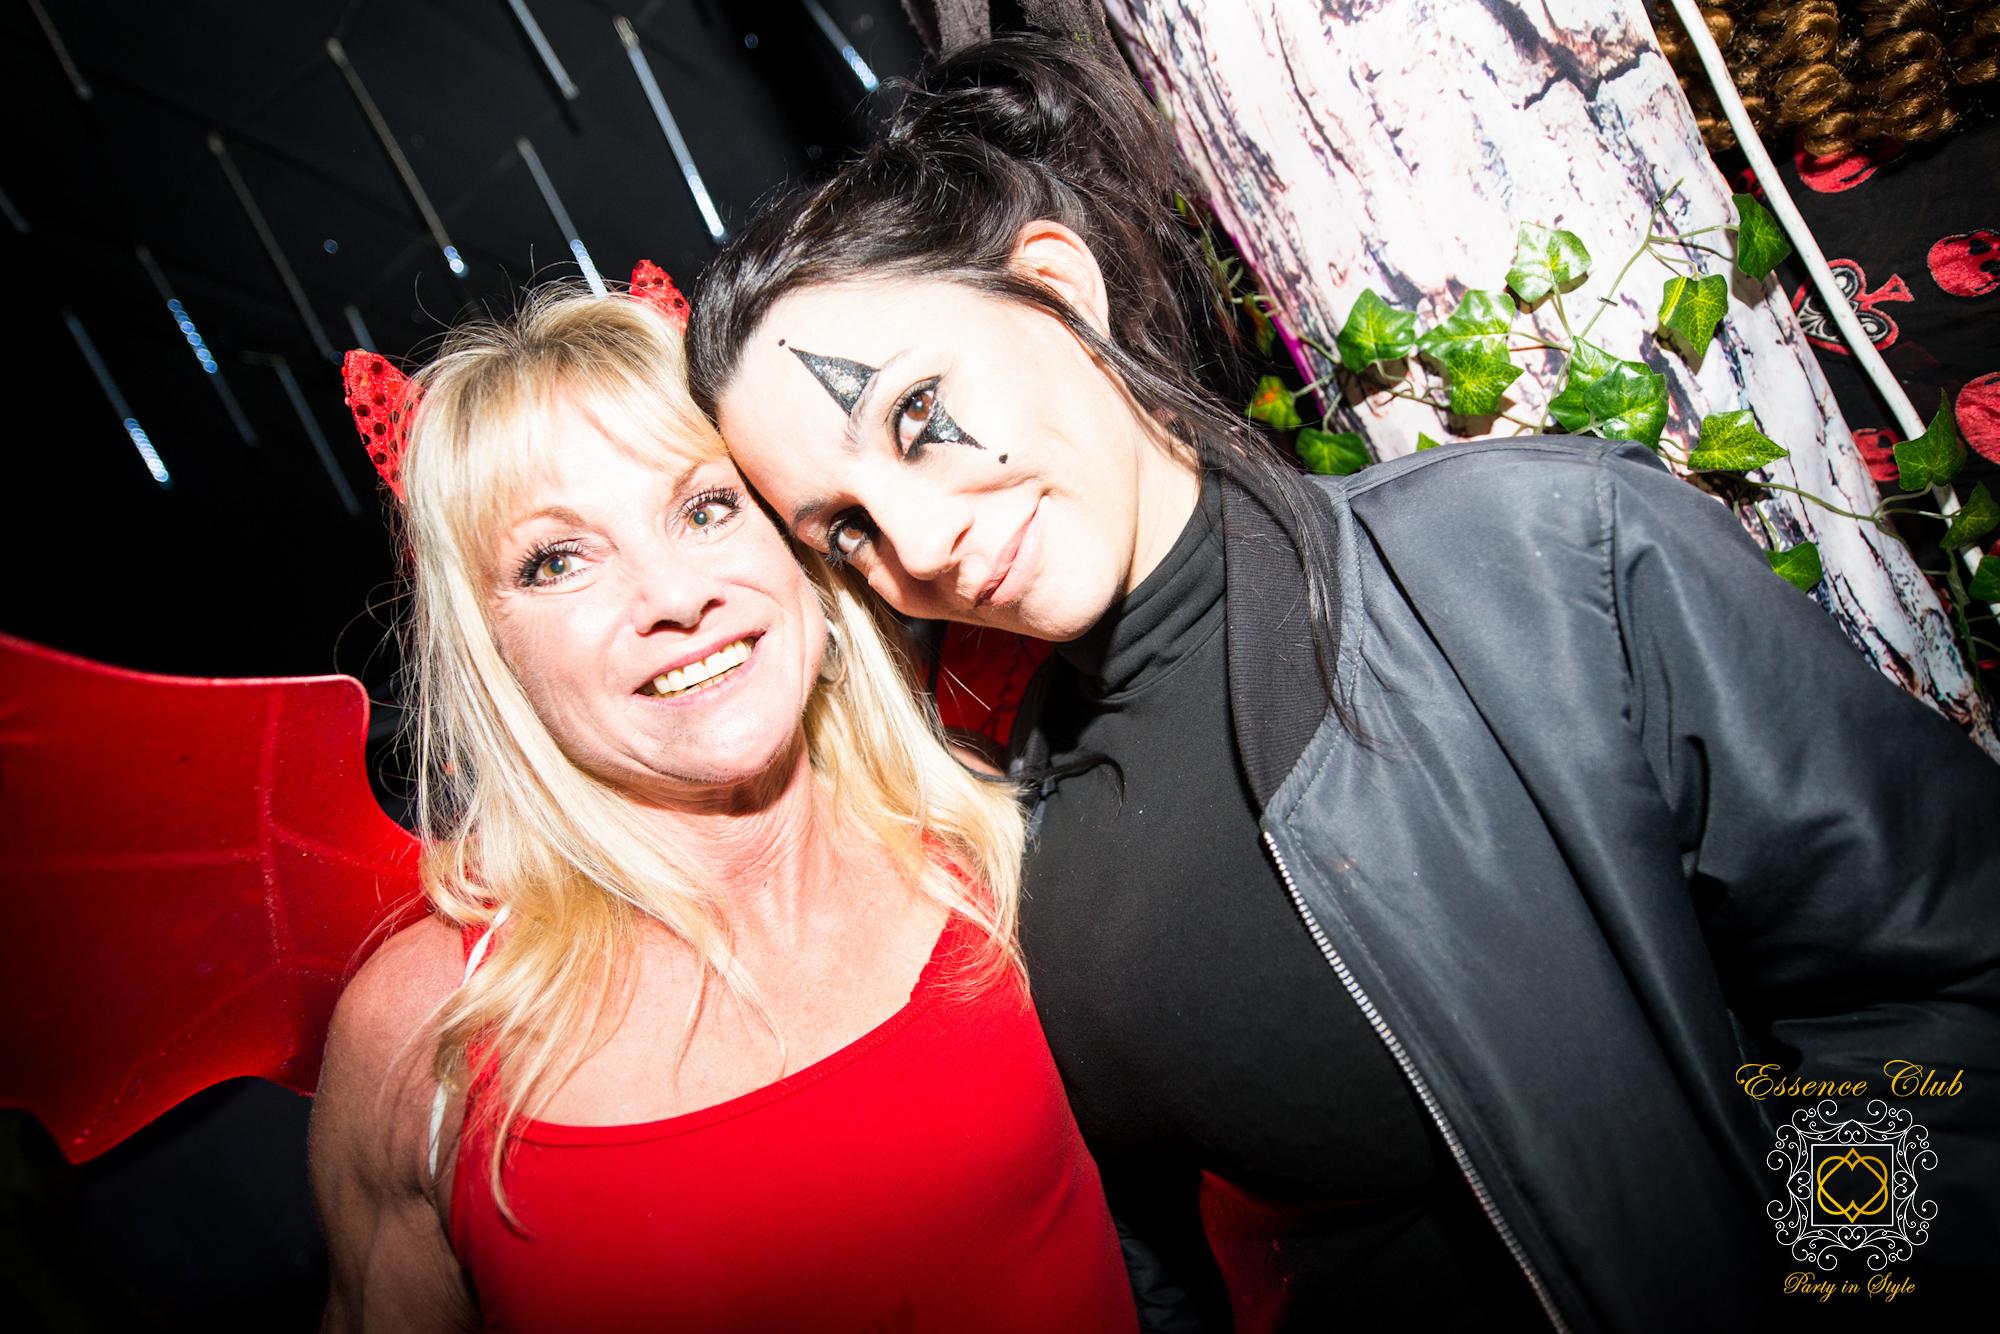 Halloween underworlld party shot